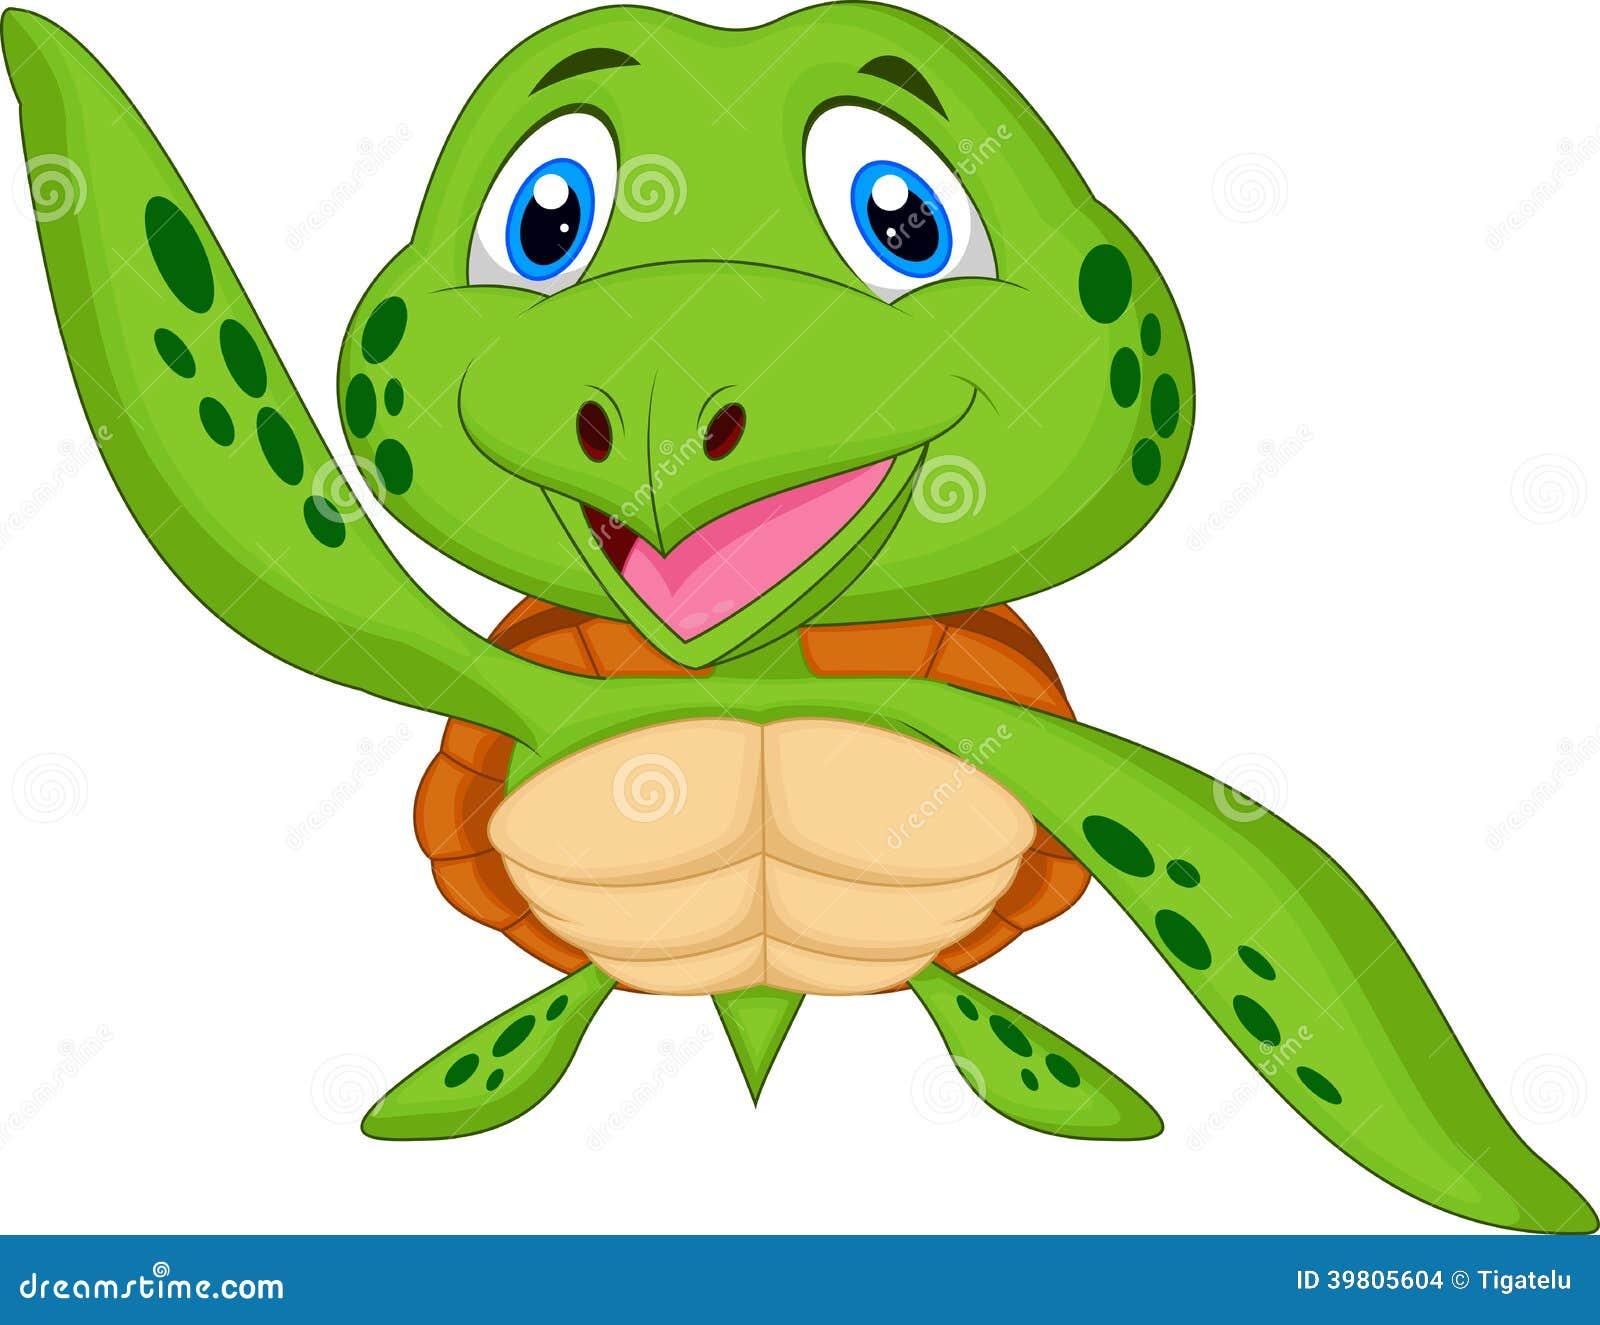 Cute animated sea turtles - photo#12